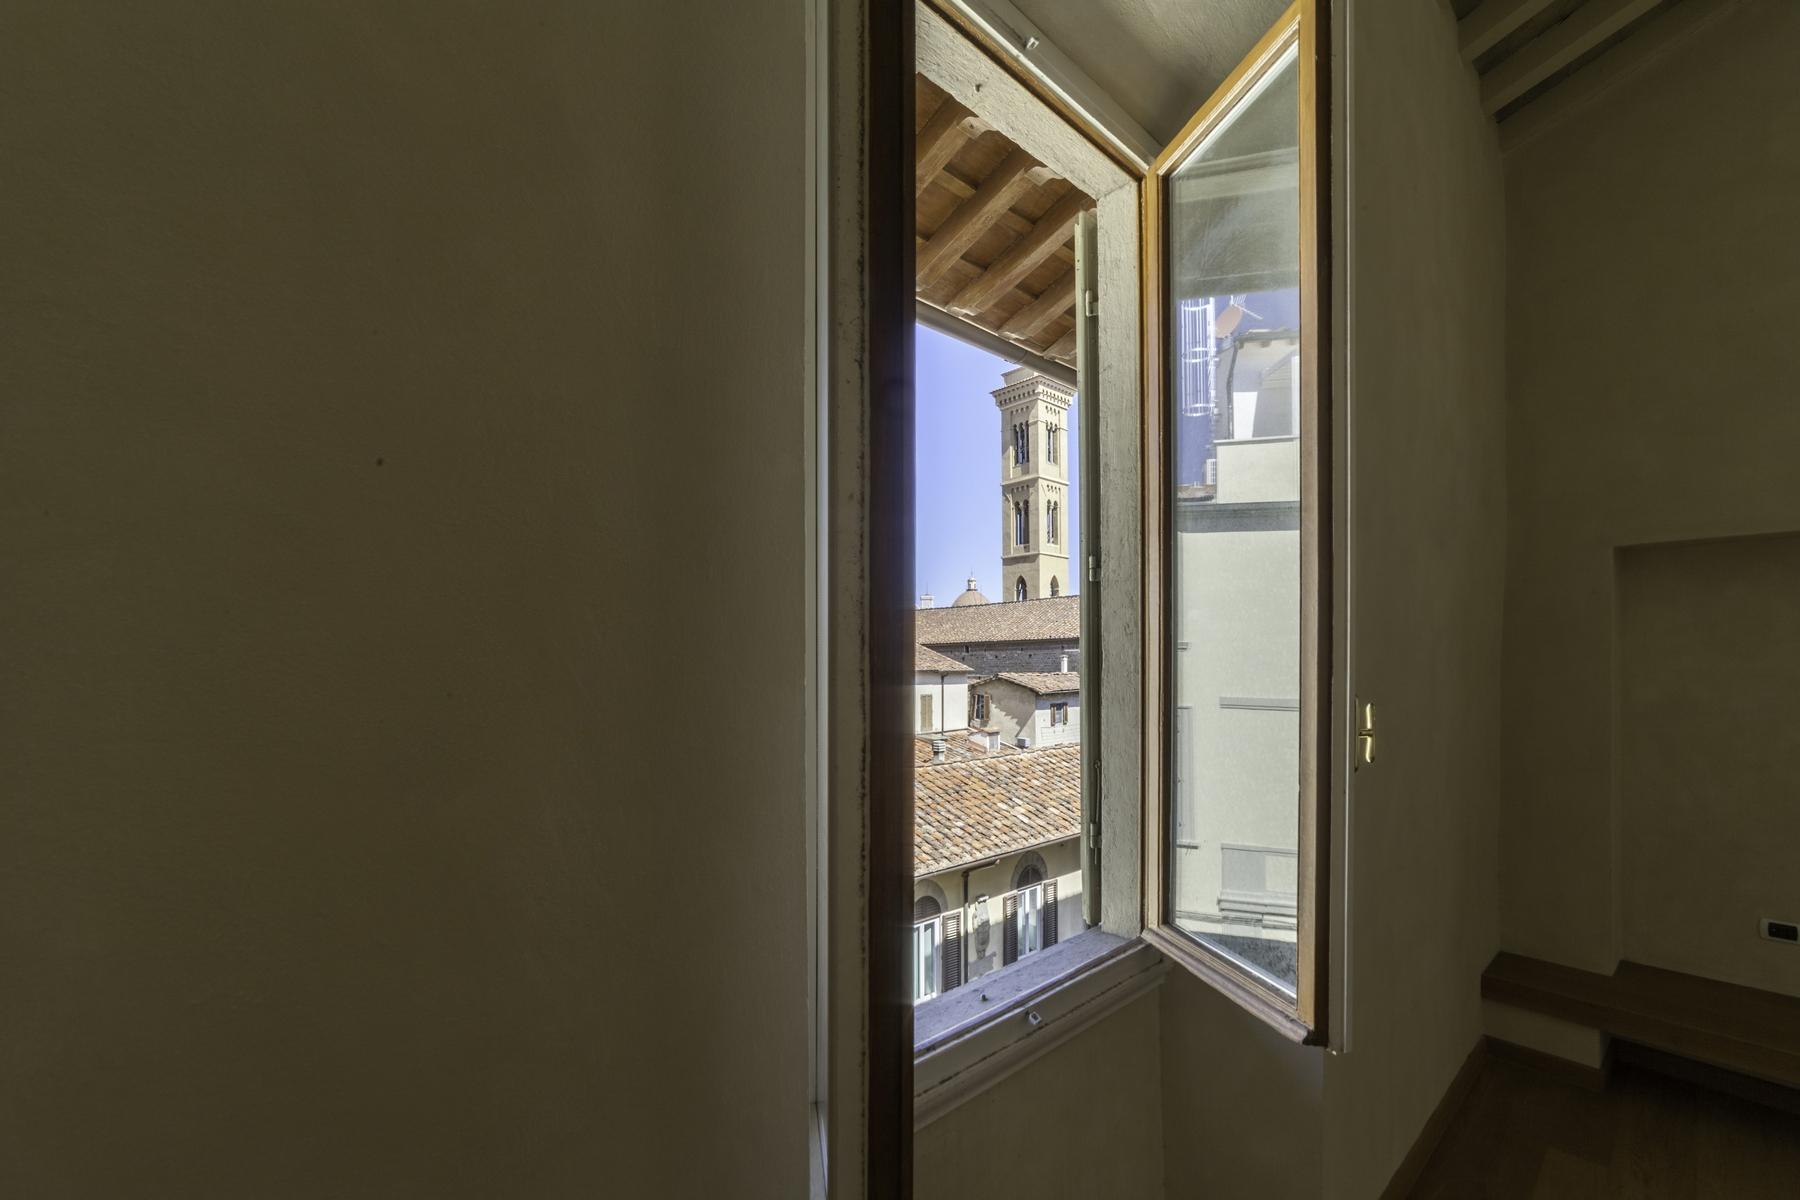 Attico in Vendita a Firenze: 5 locali, 180 mq - Foto 7